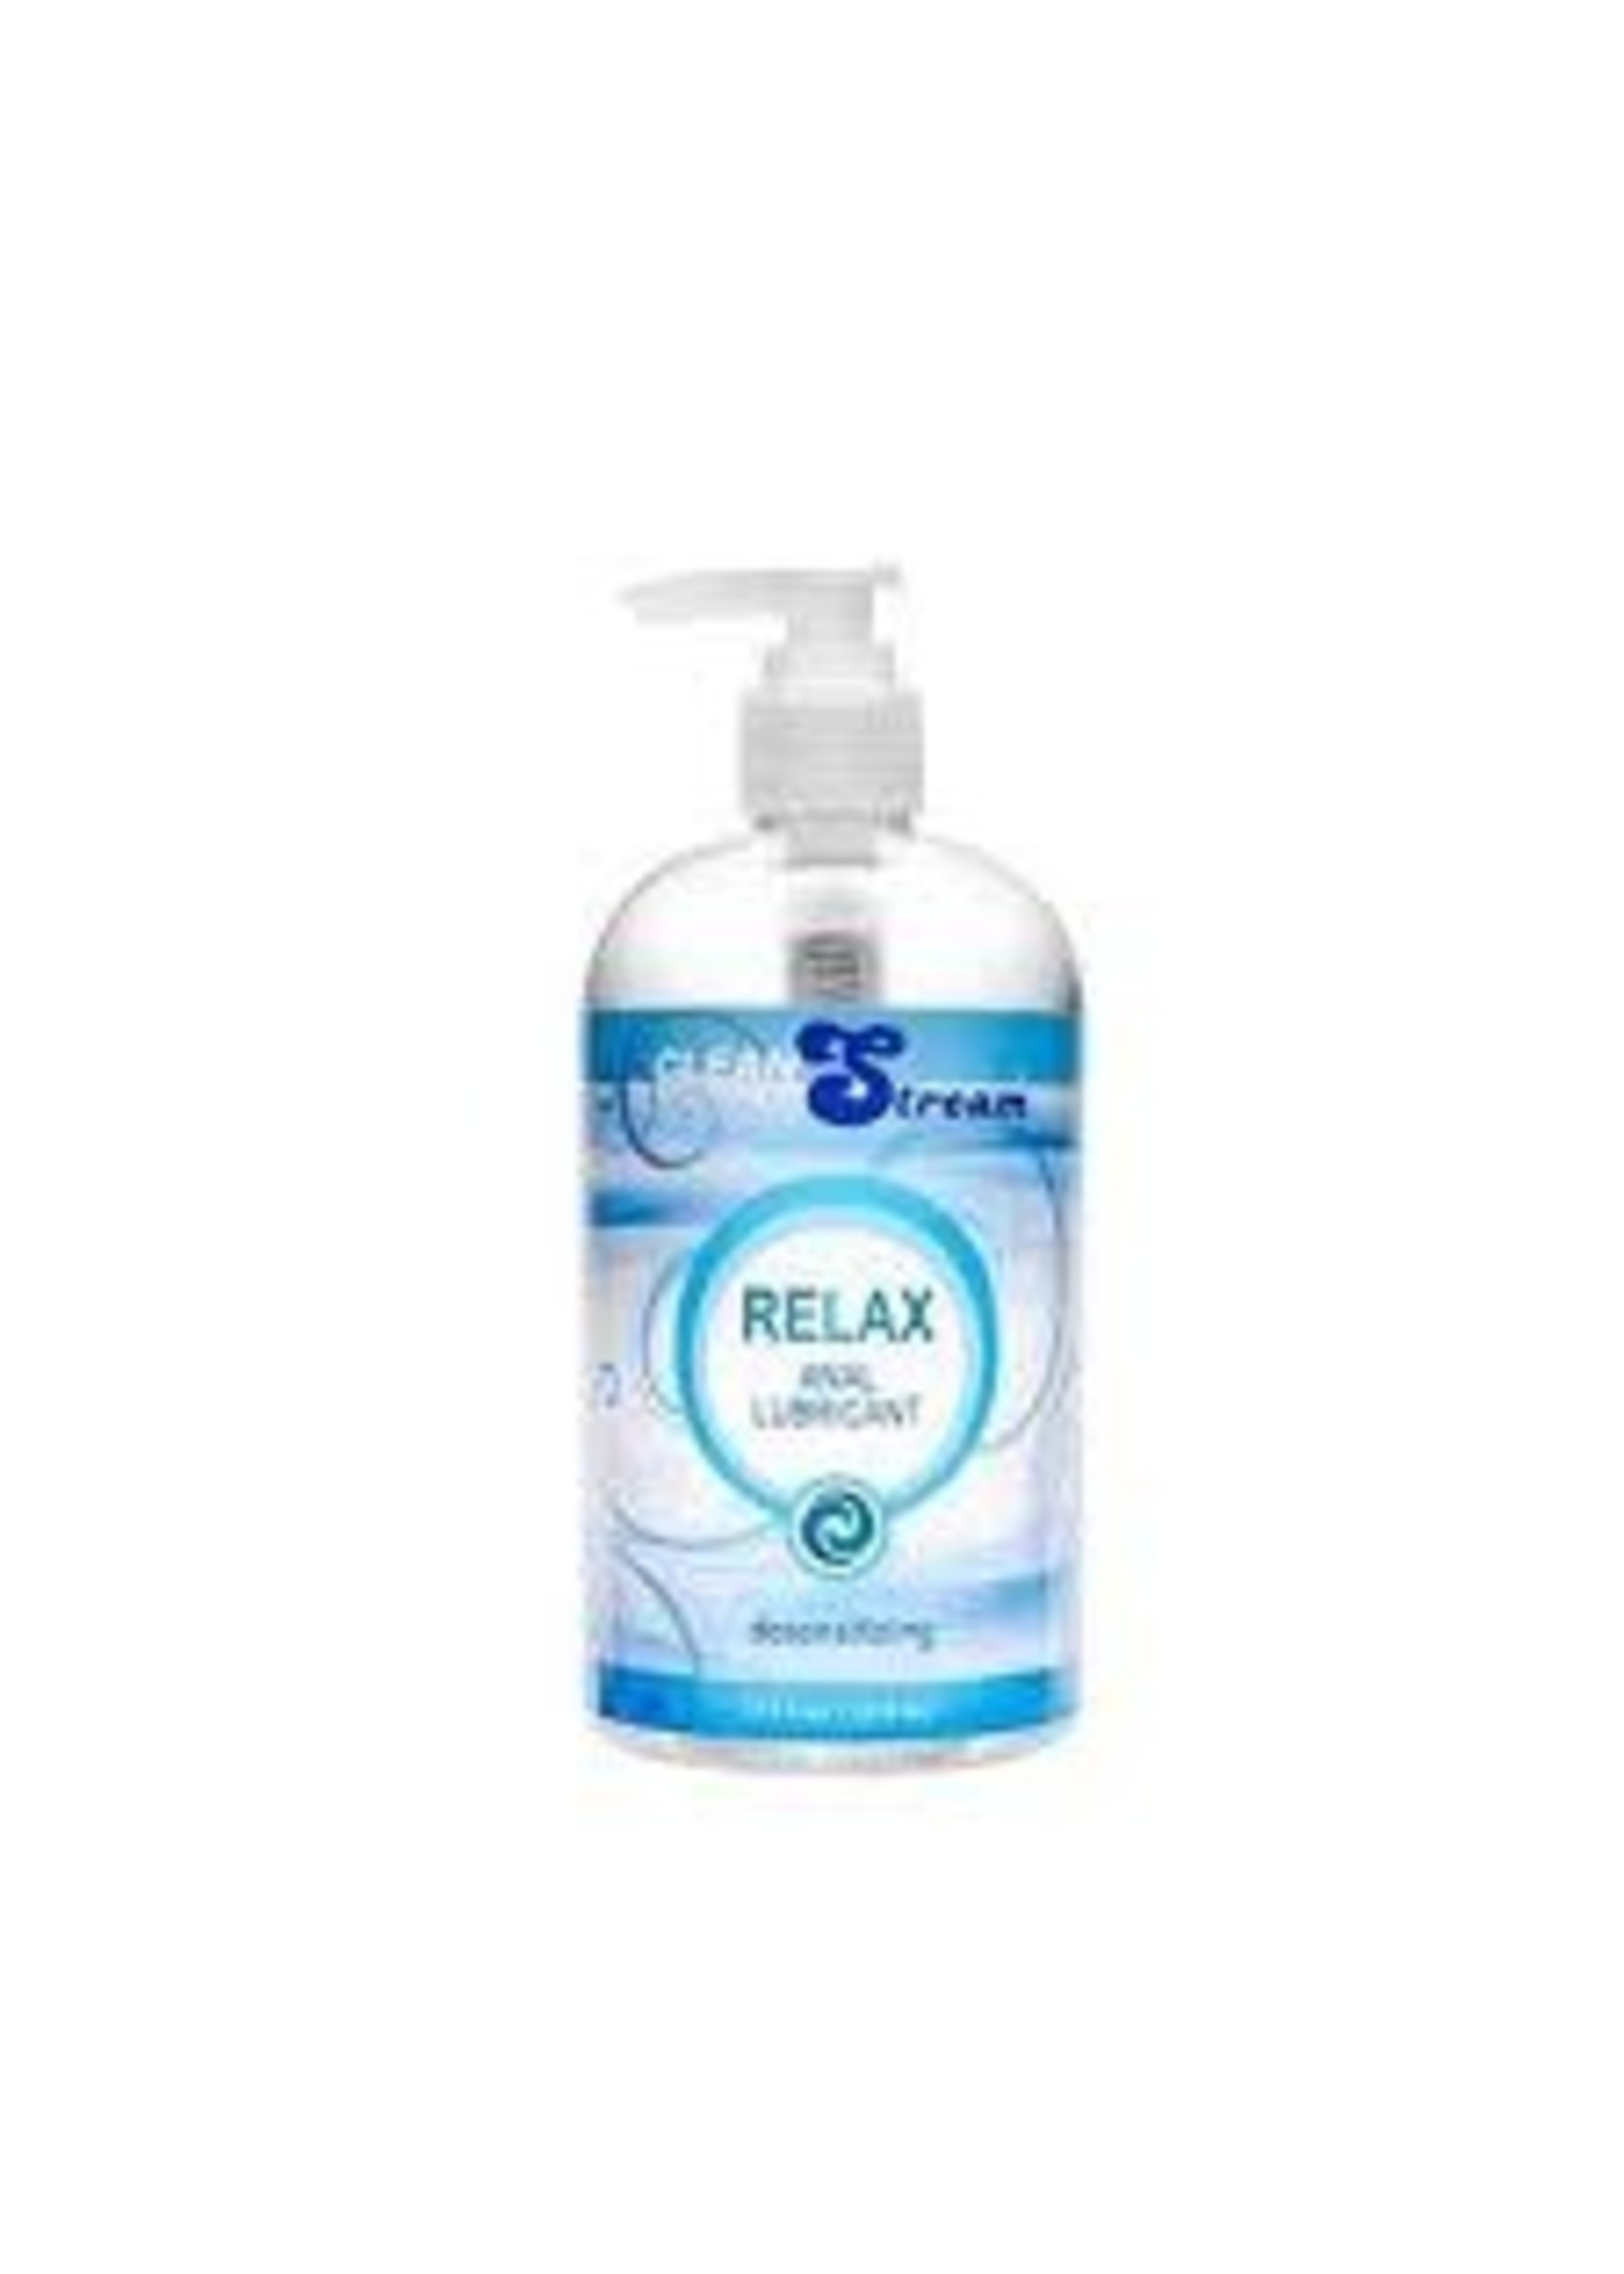 Clean Stream Clean Stream Relax Desensitizing Anal Lube